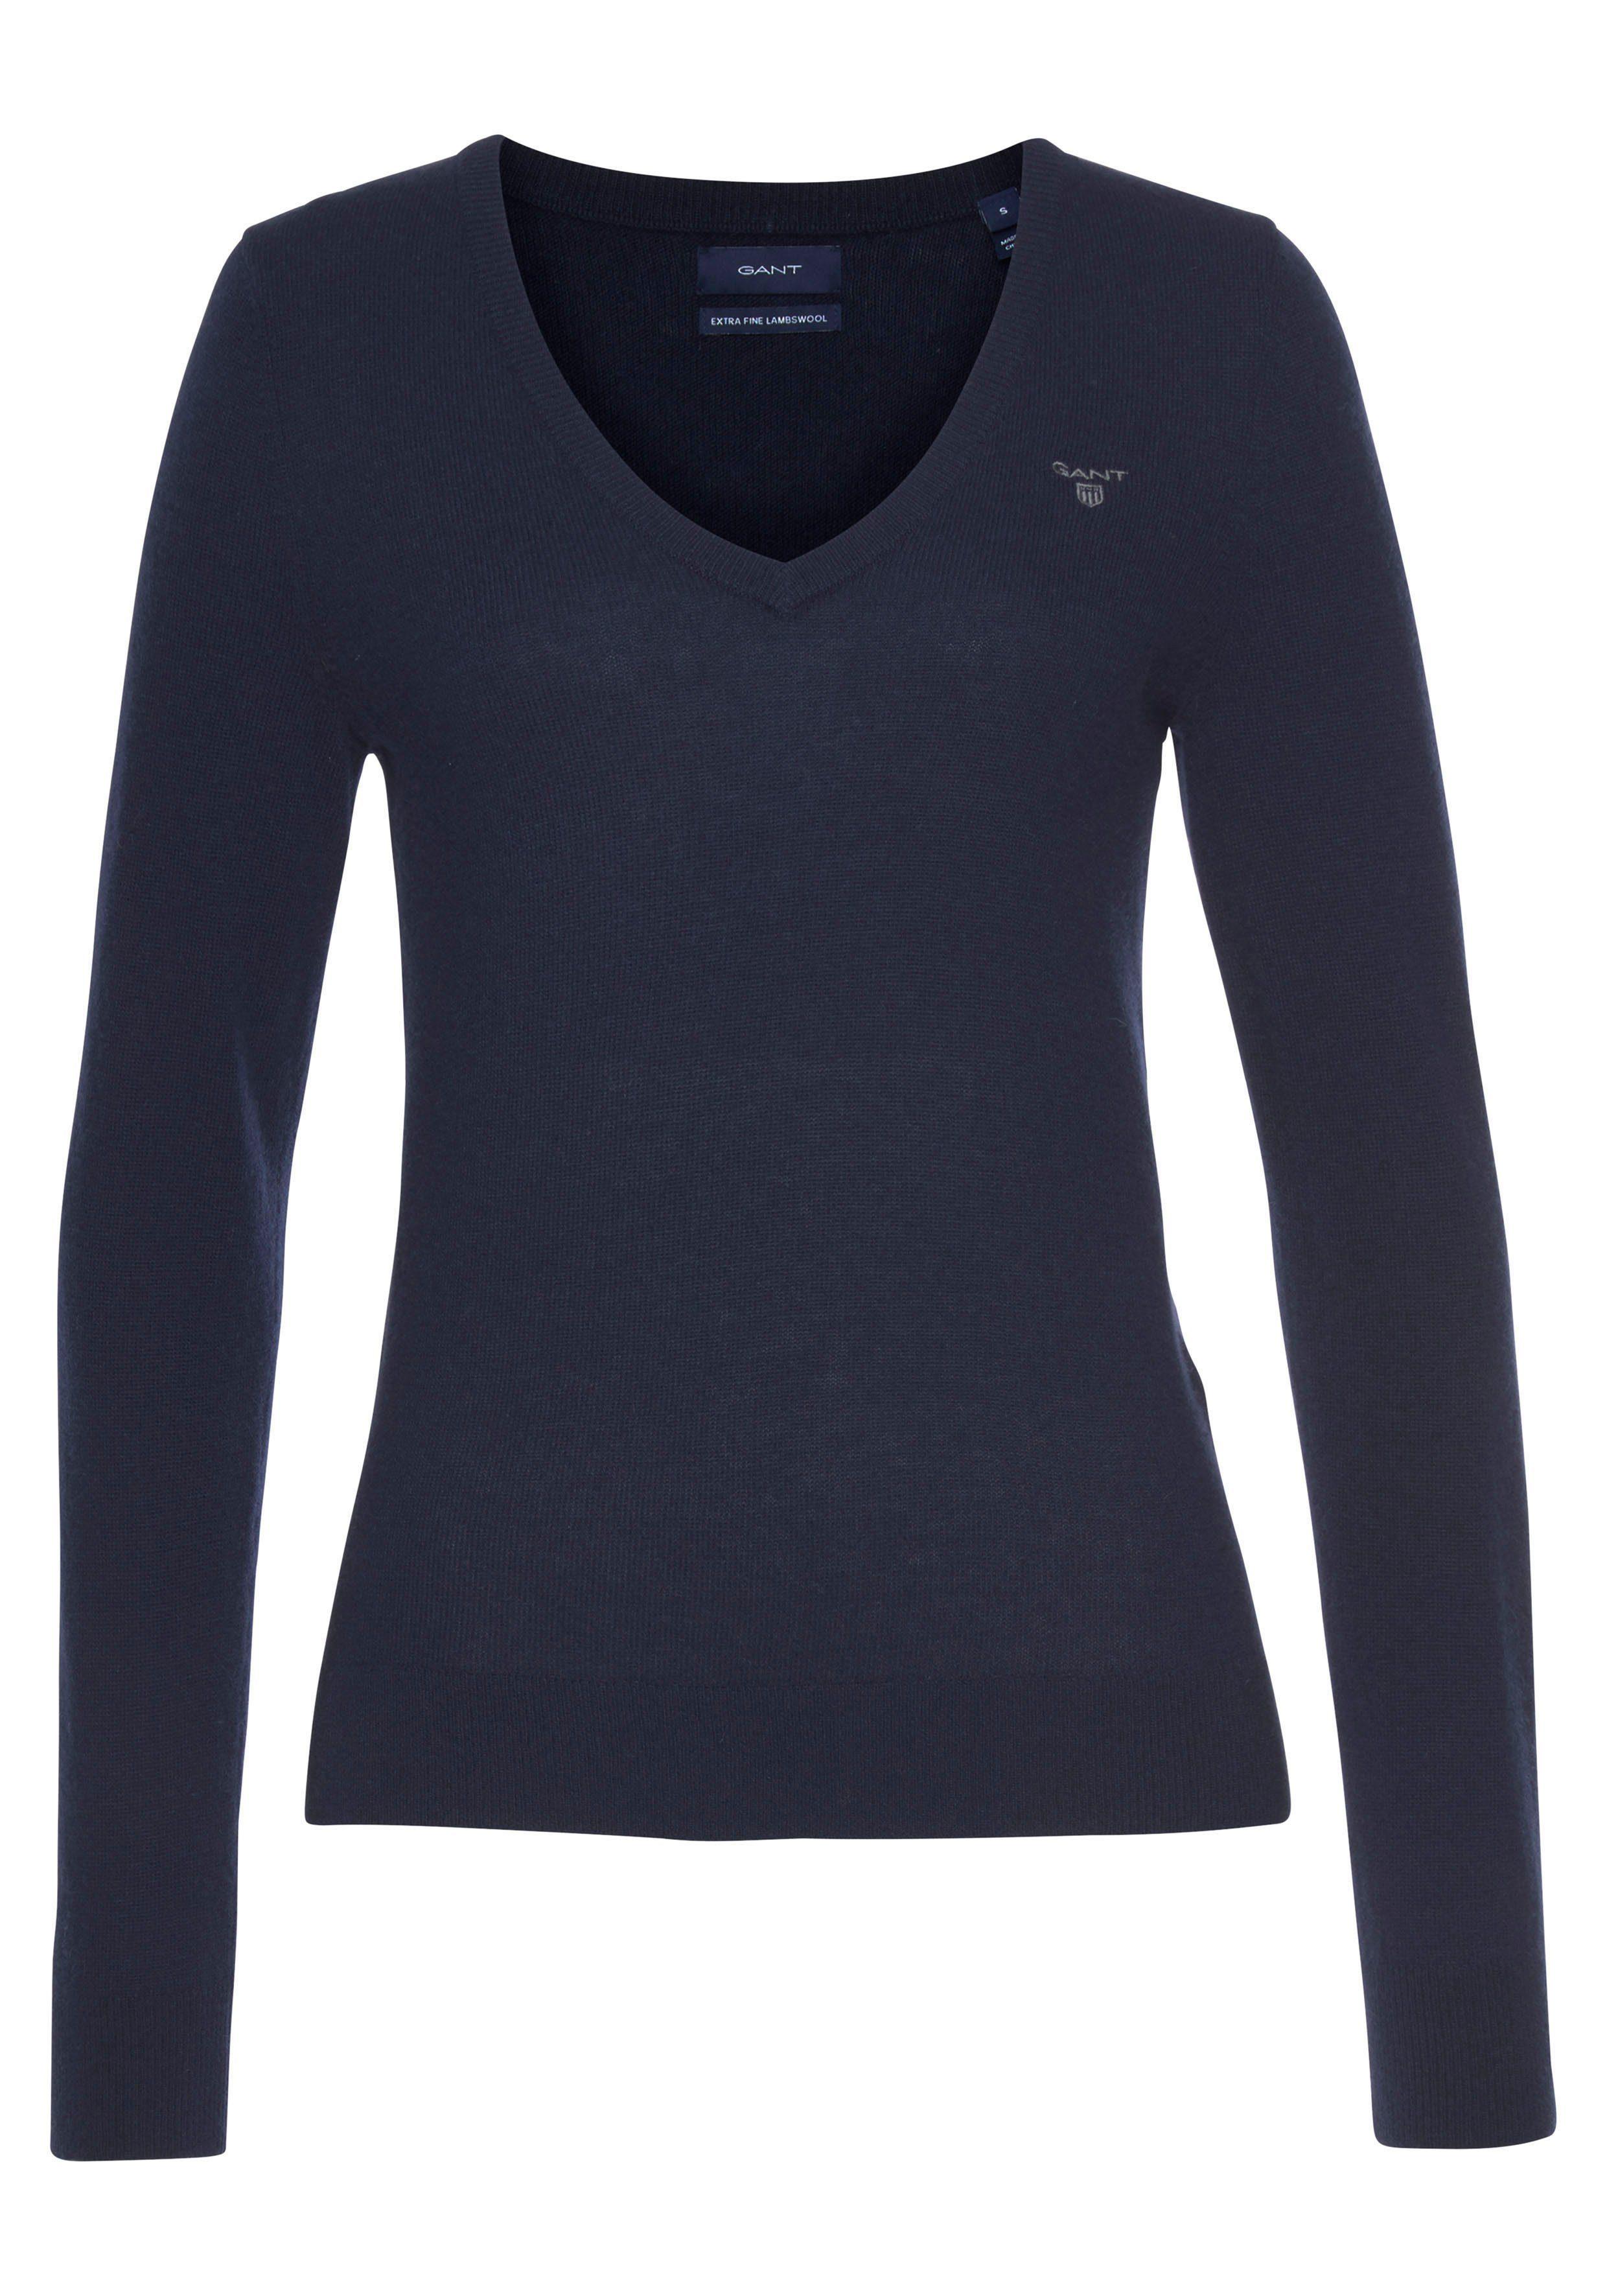 XL Gr bordeaux Gant V-Ausschnitt-Pullover aus hochwertiger Wolle 42